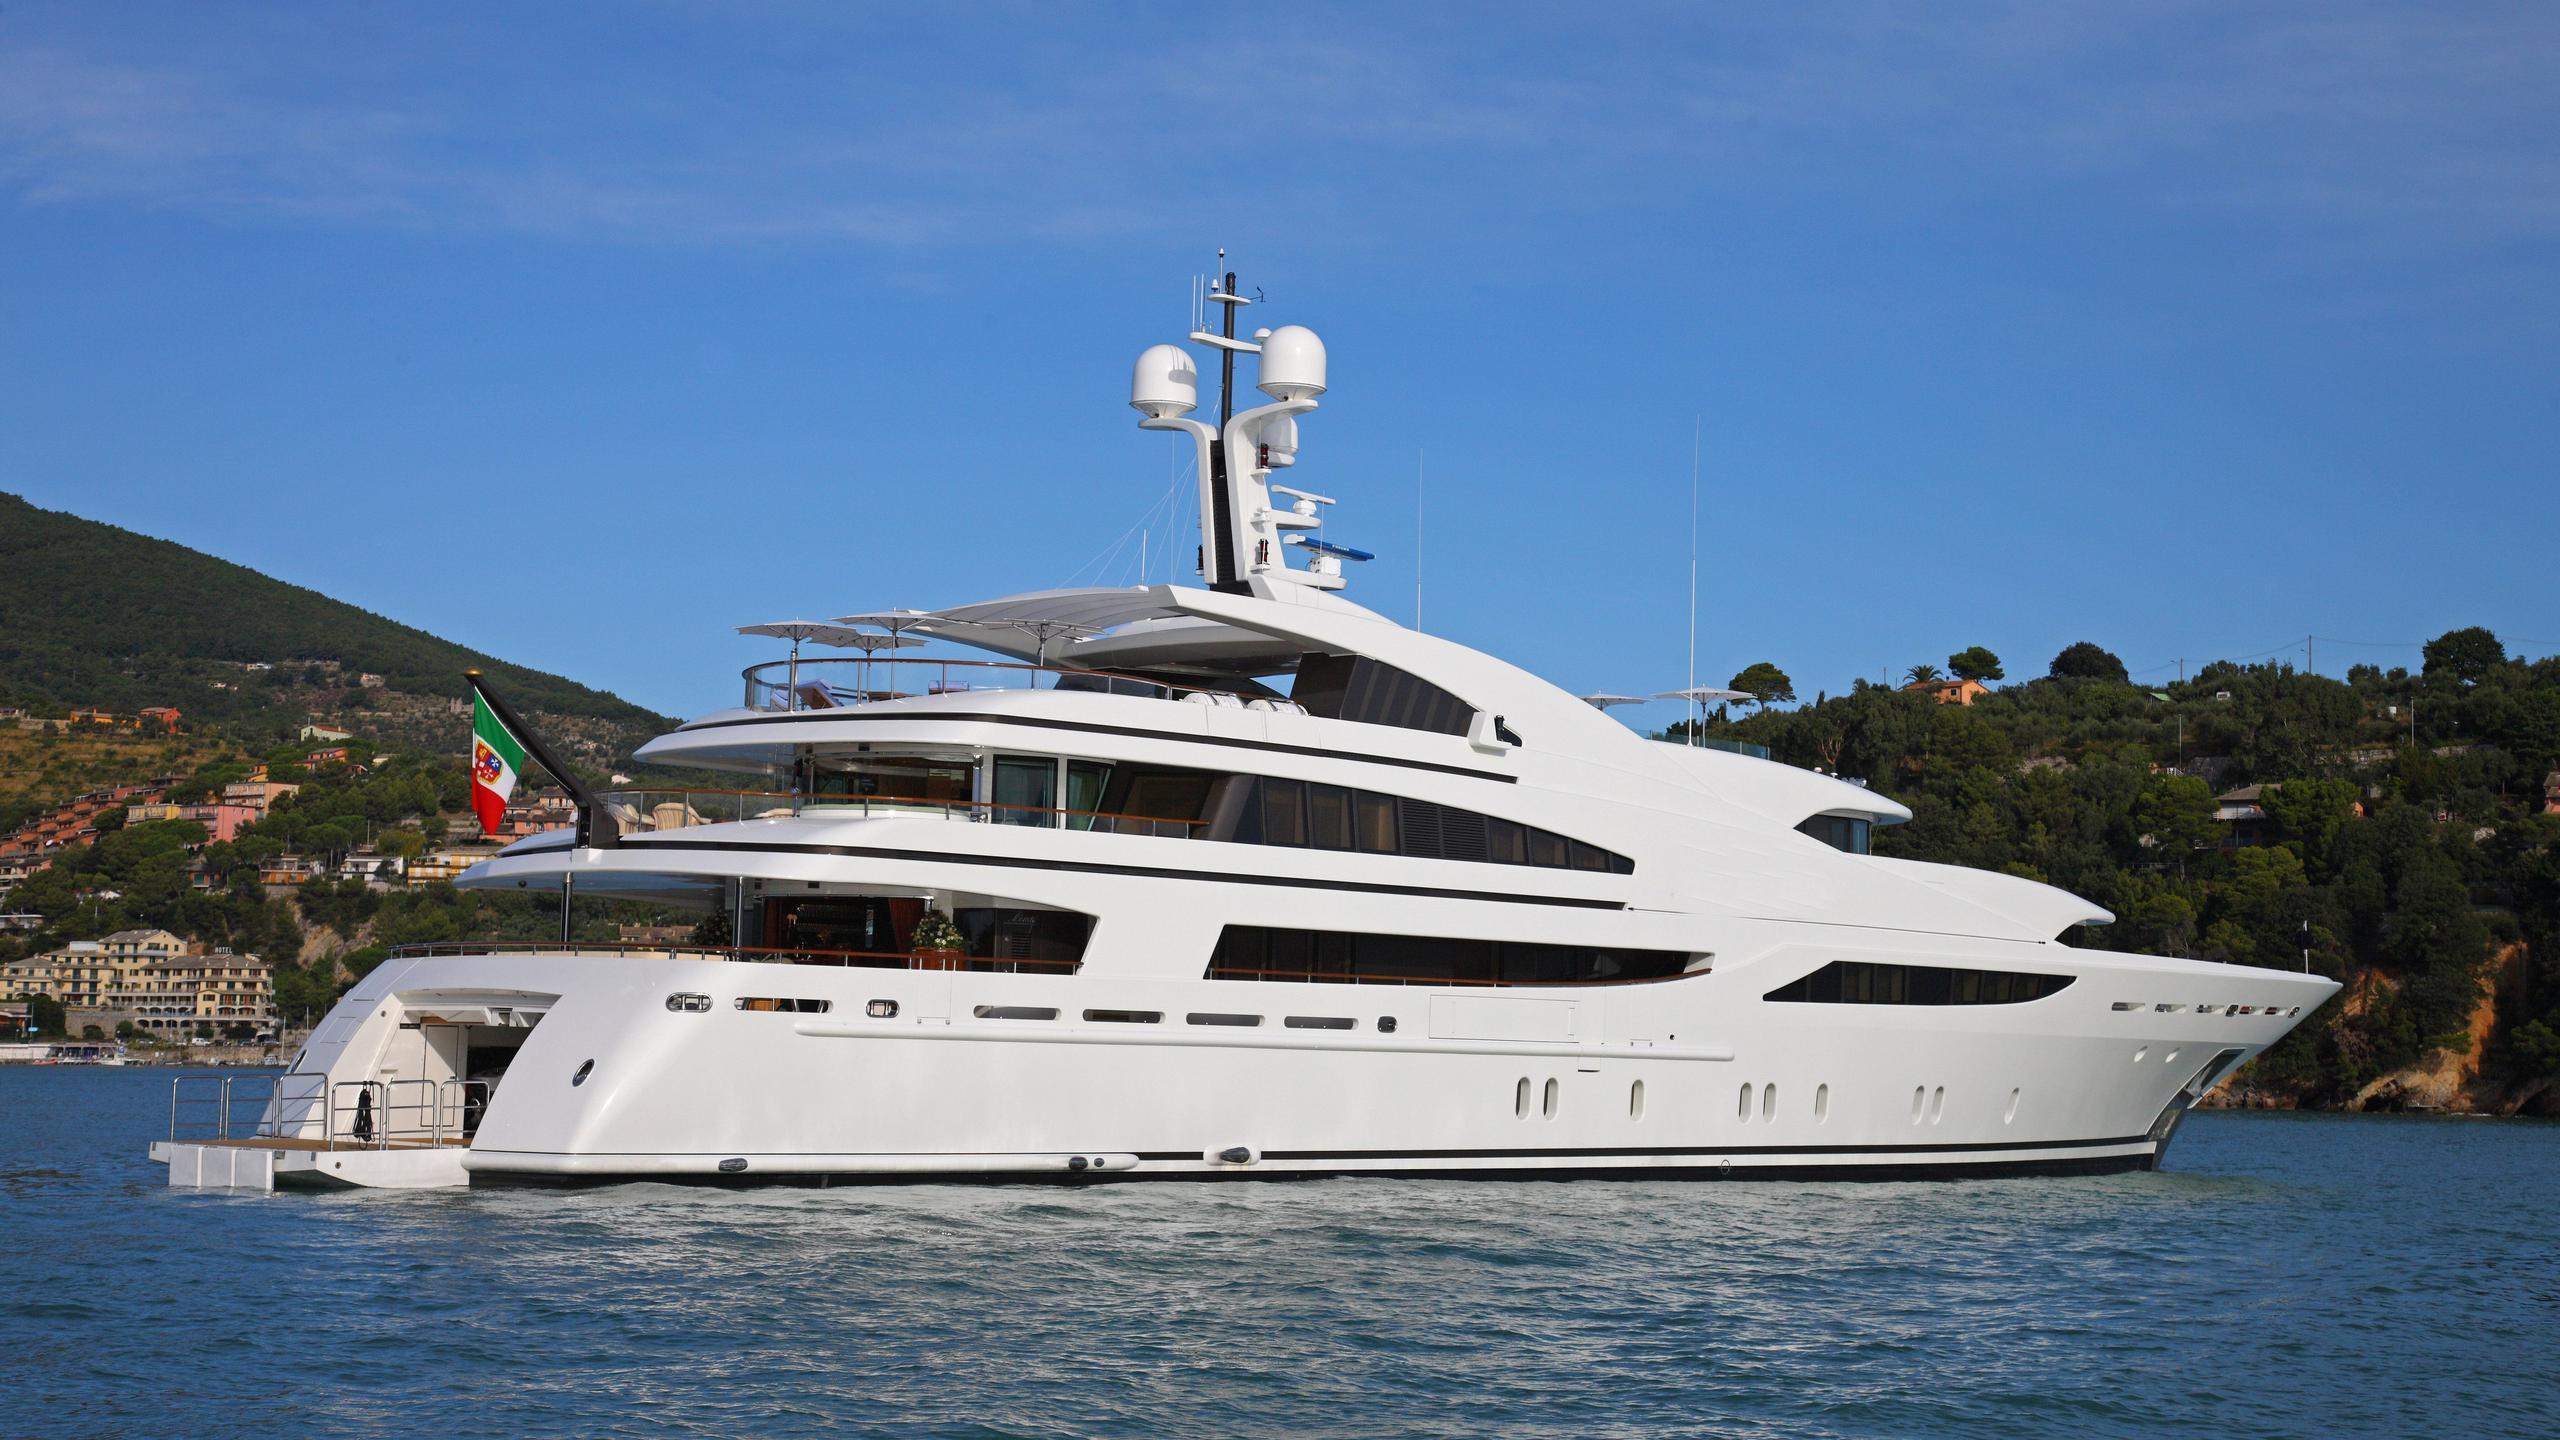 st-david-yacht-for-sale-profile